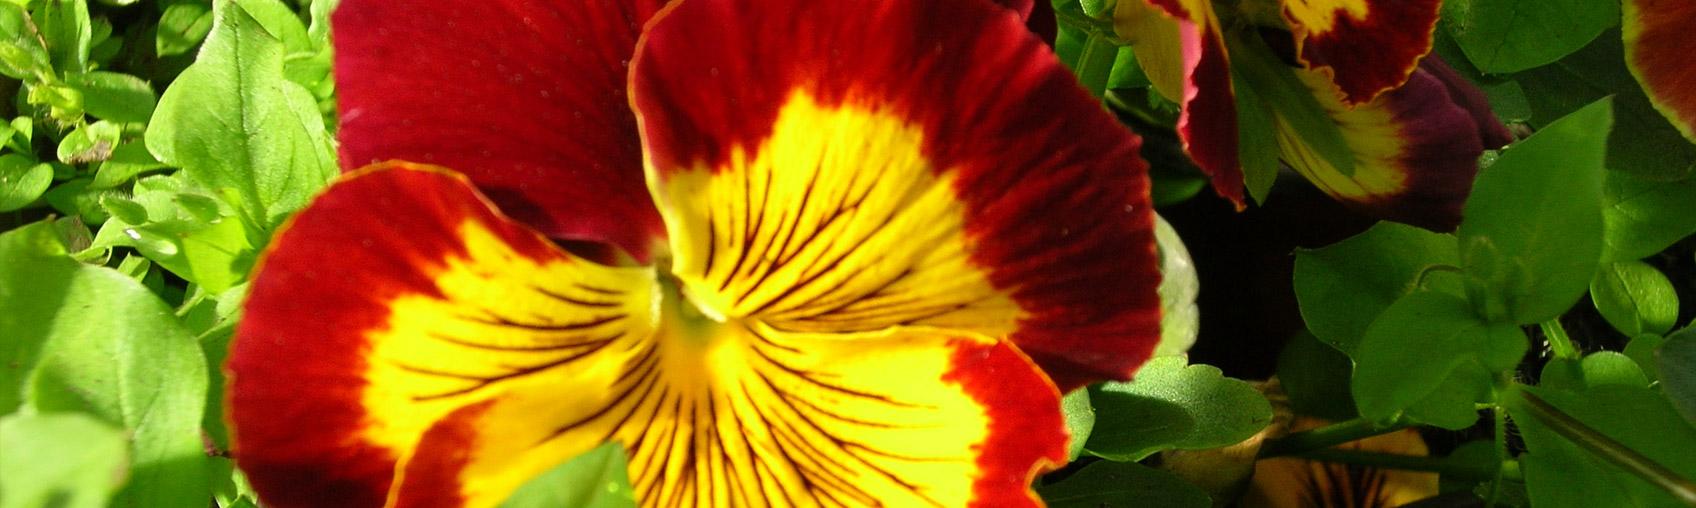 Trauerfloristik Blumen Weese